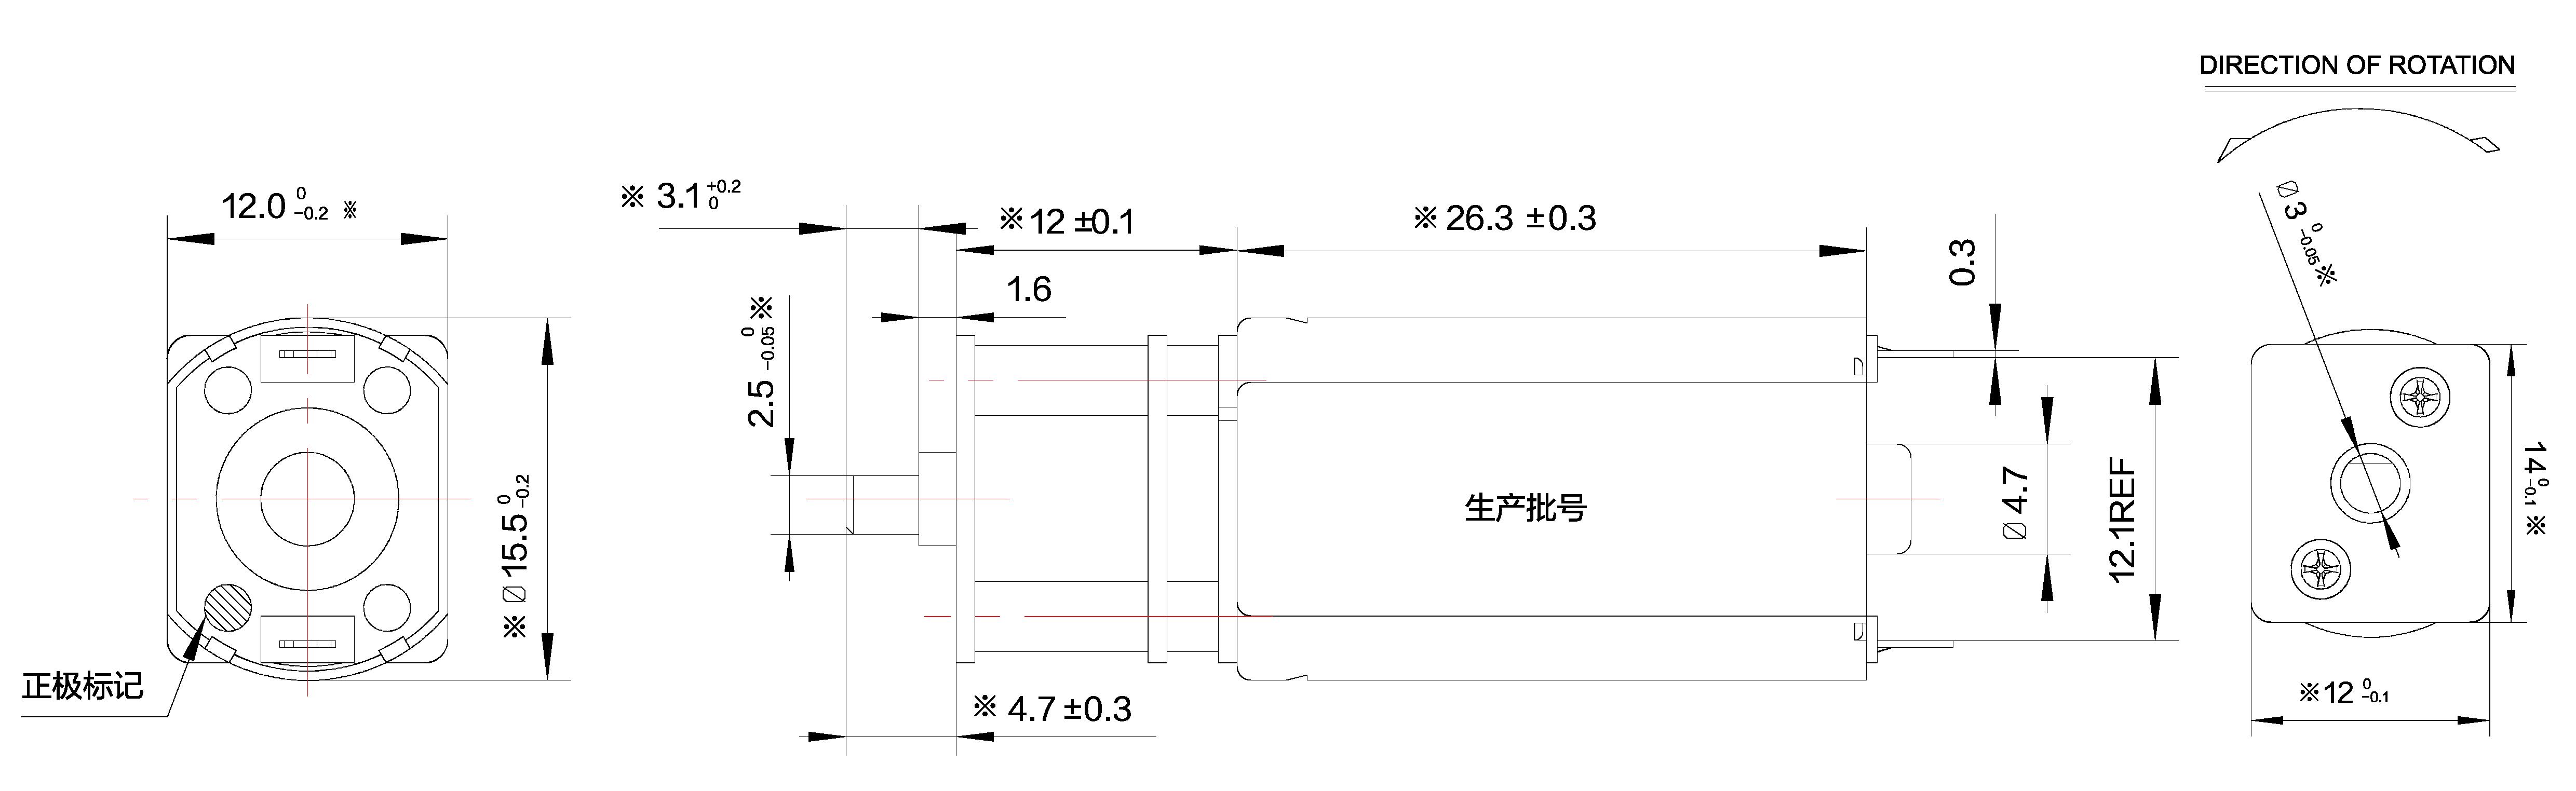 Gear-box-Motor-14JFG_Outline-drawing-01-01